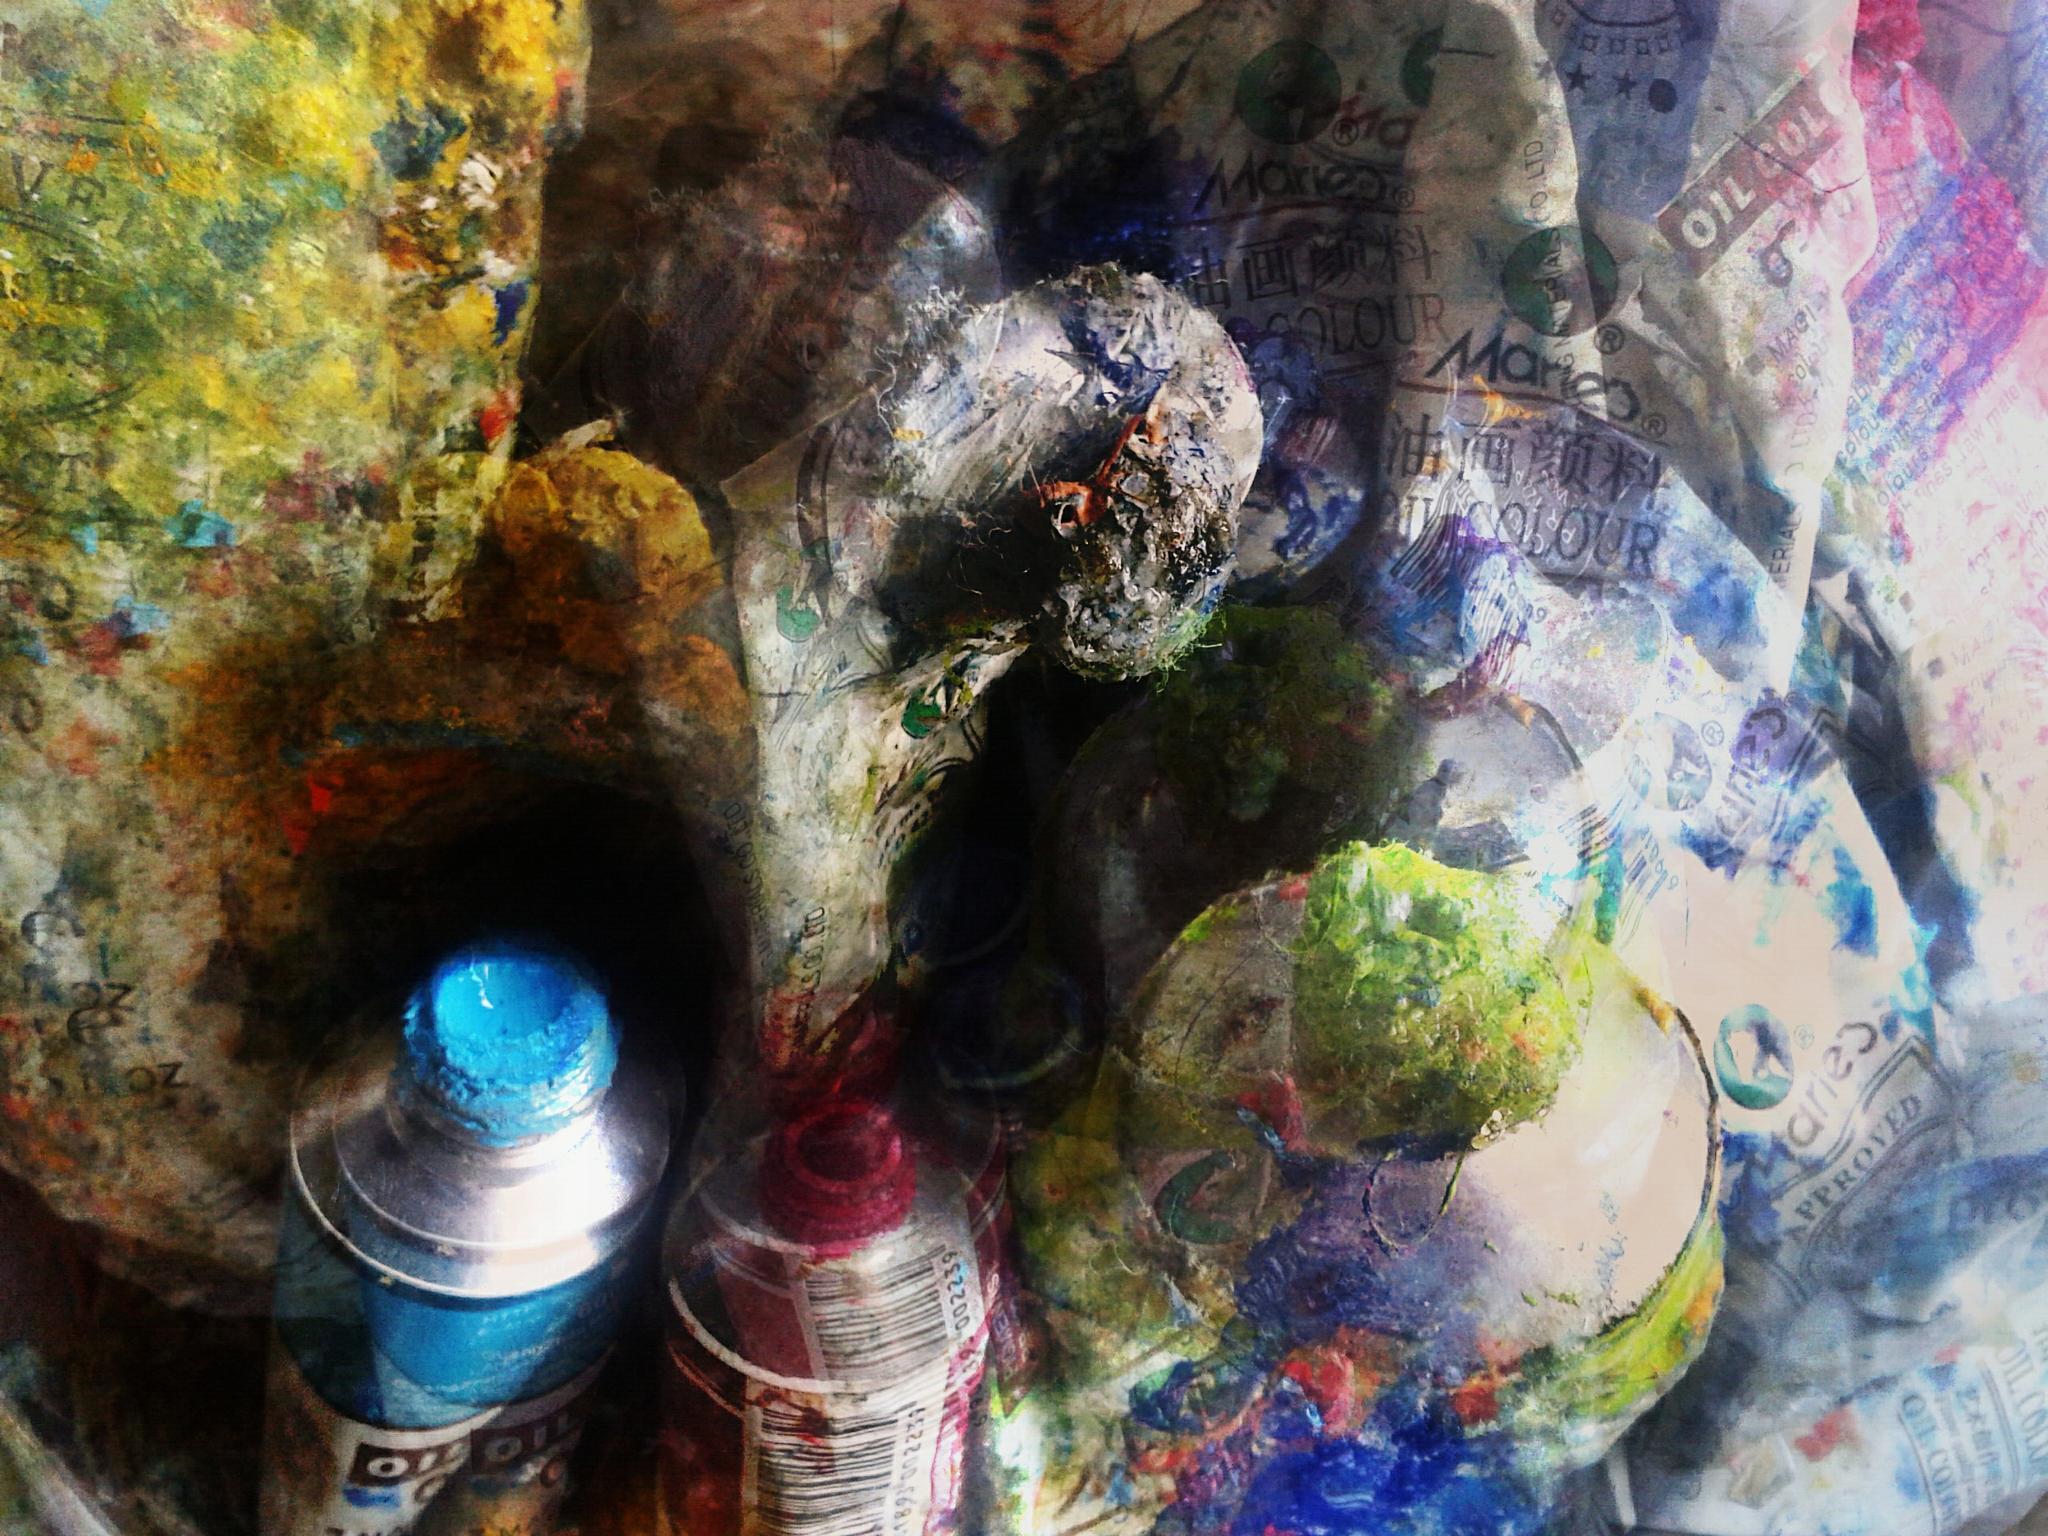 photos in oil paints by slavko.pjevcevic